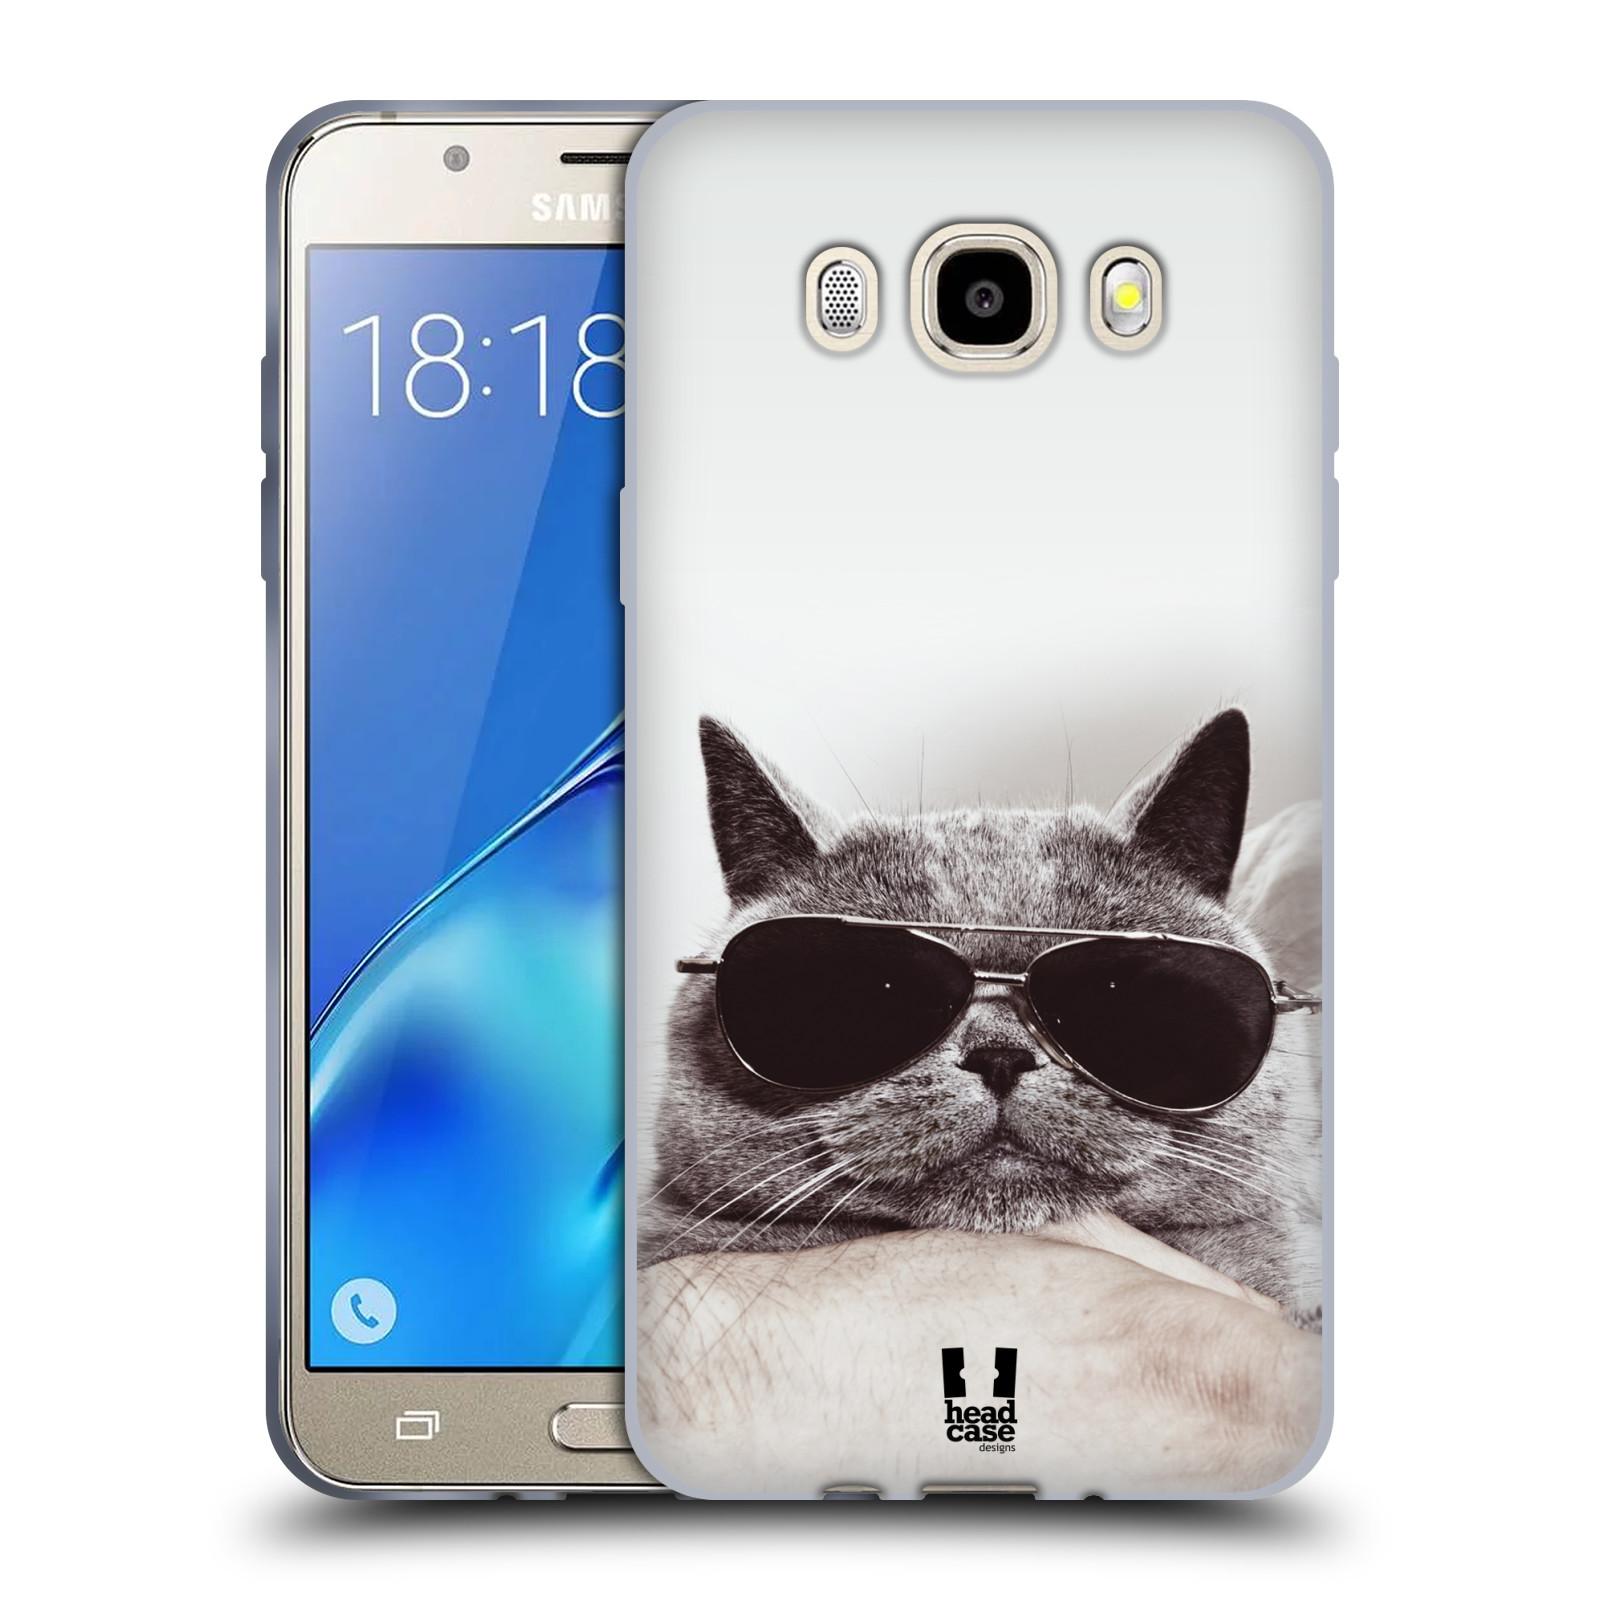 Silikonové pouzdro na mobil Samsung Galaxy J5 (2016) HEAD CASE KOTĚ S BRÝLEMI (Silikonový kryt či obal na mobilní telefon Samsung Galaxy J5 (2016) SM-J510)